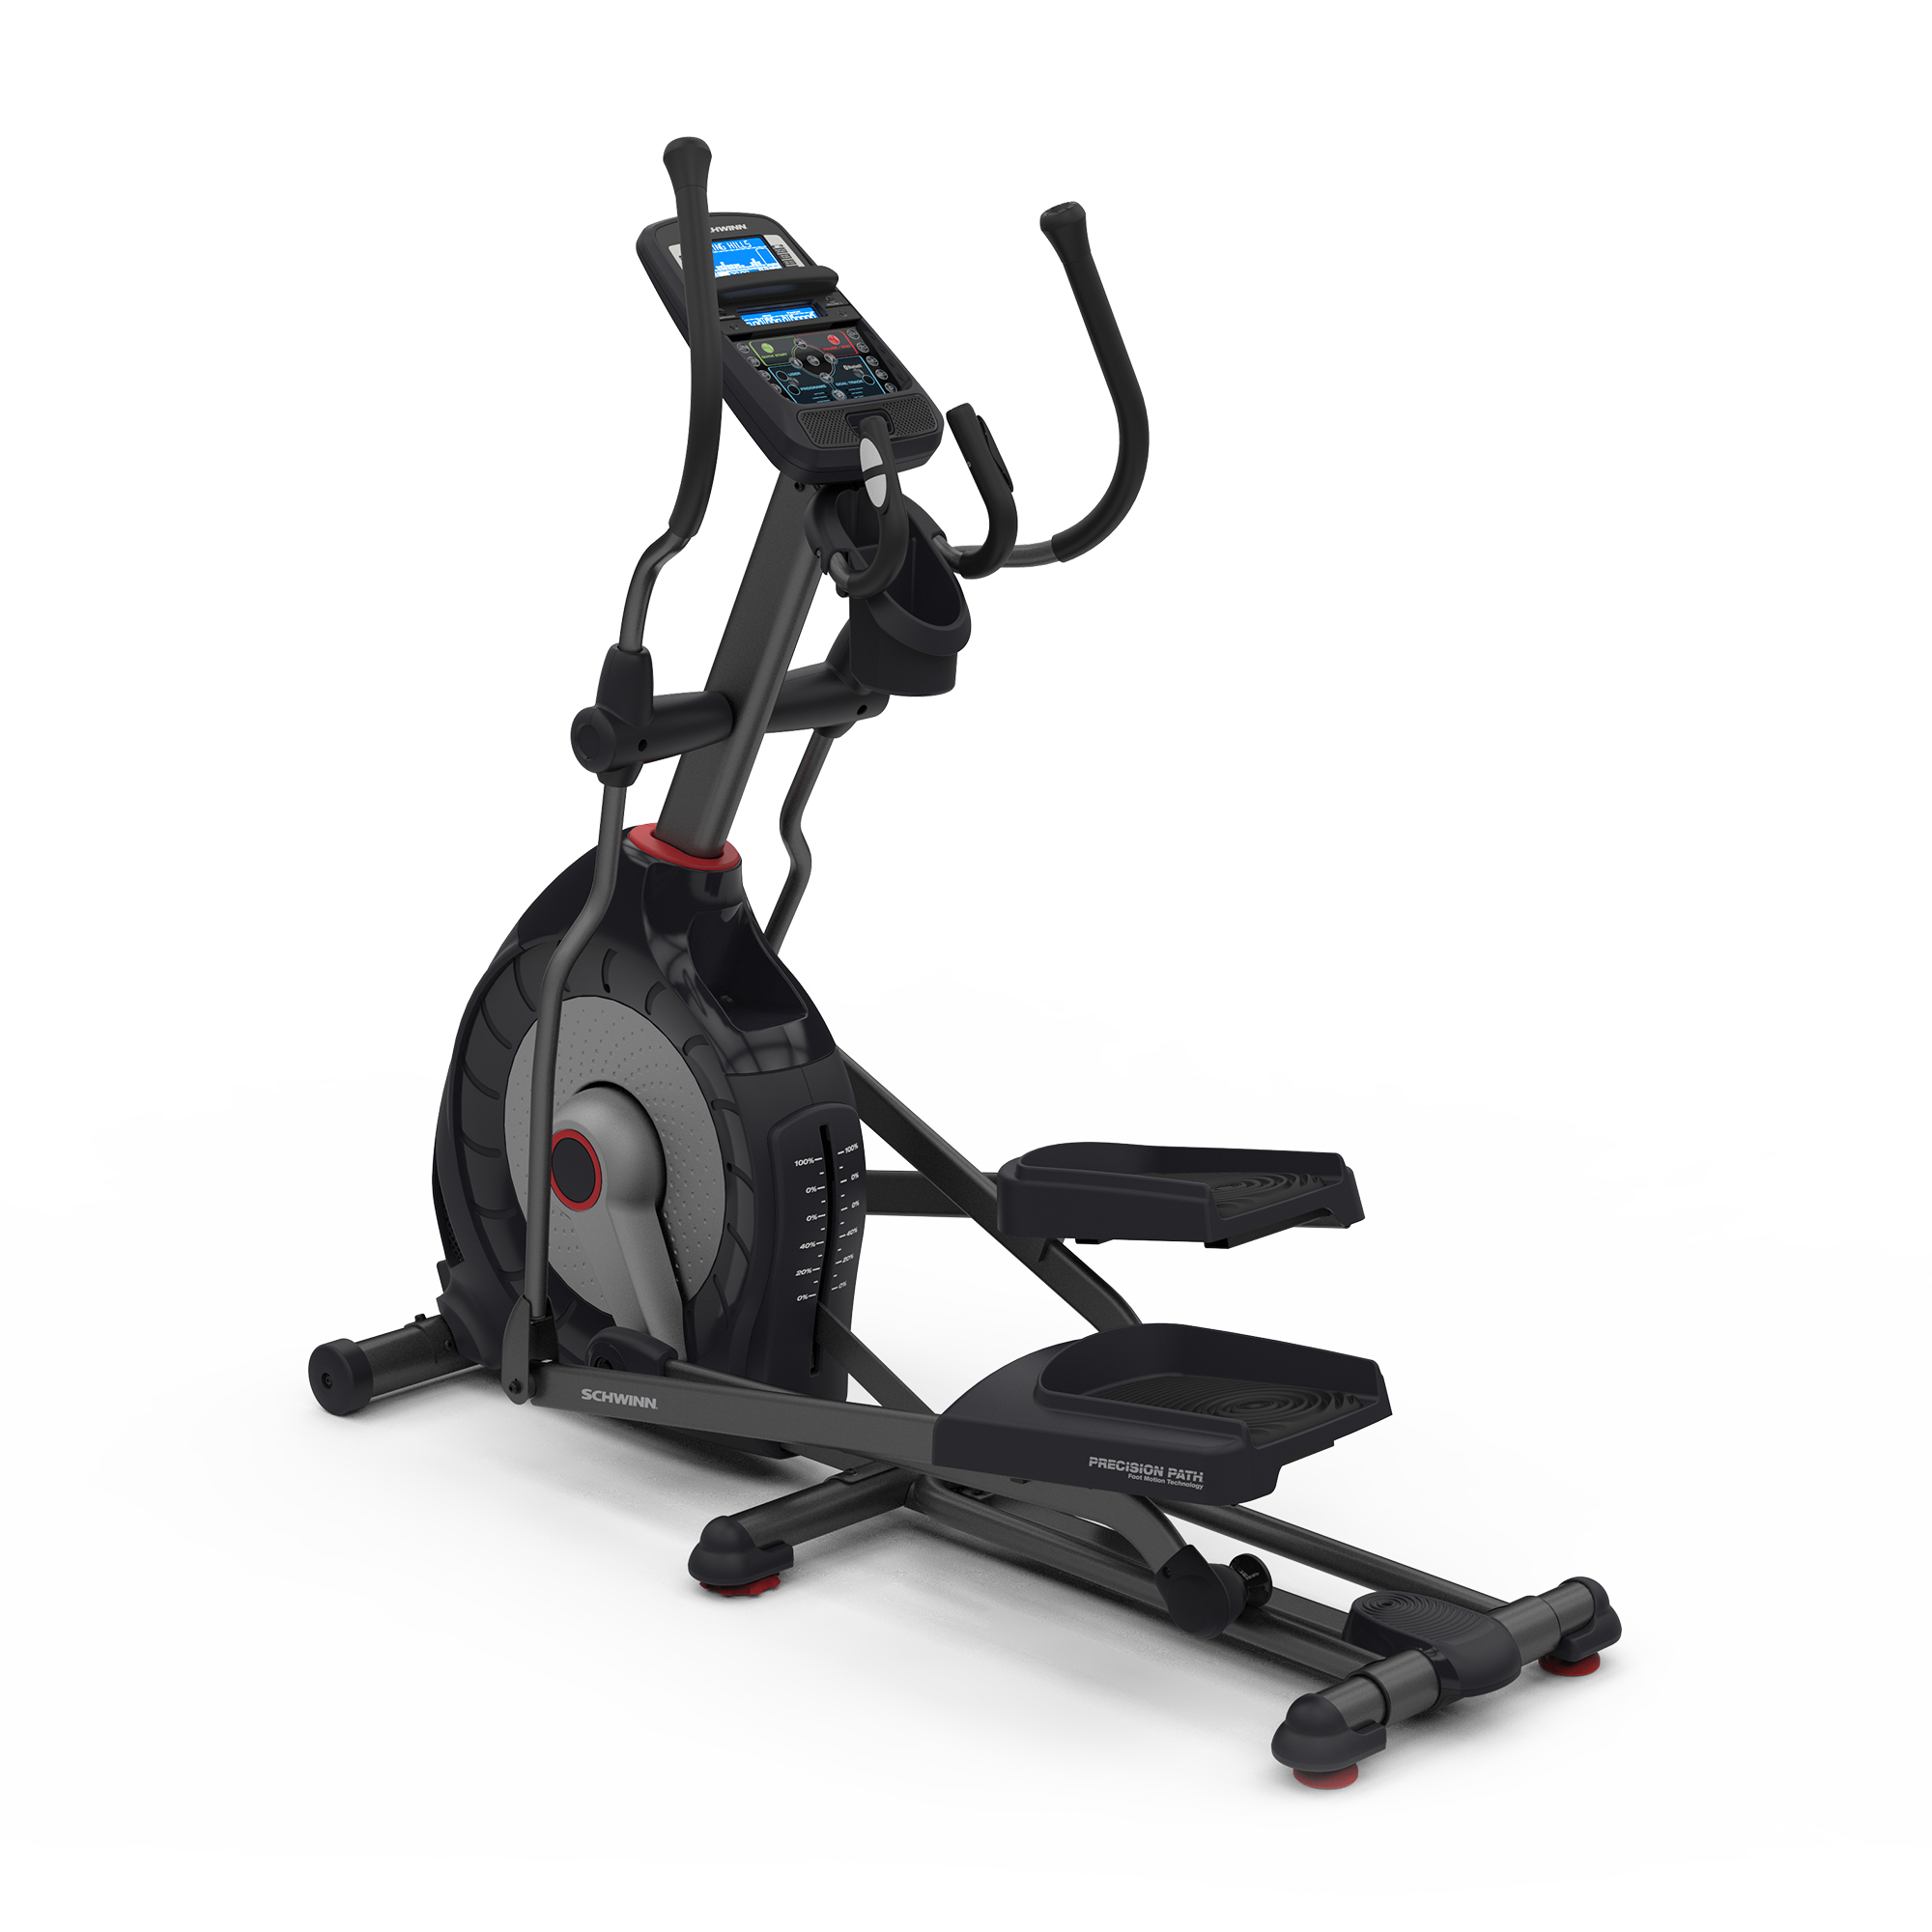 img elliptical trainer trainers mat cardio mats sole cross